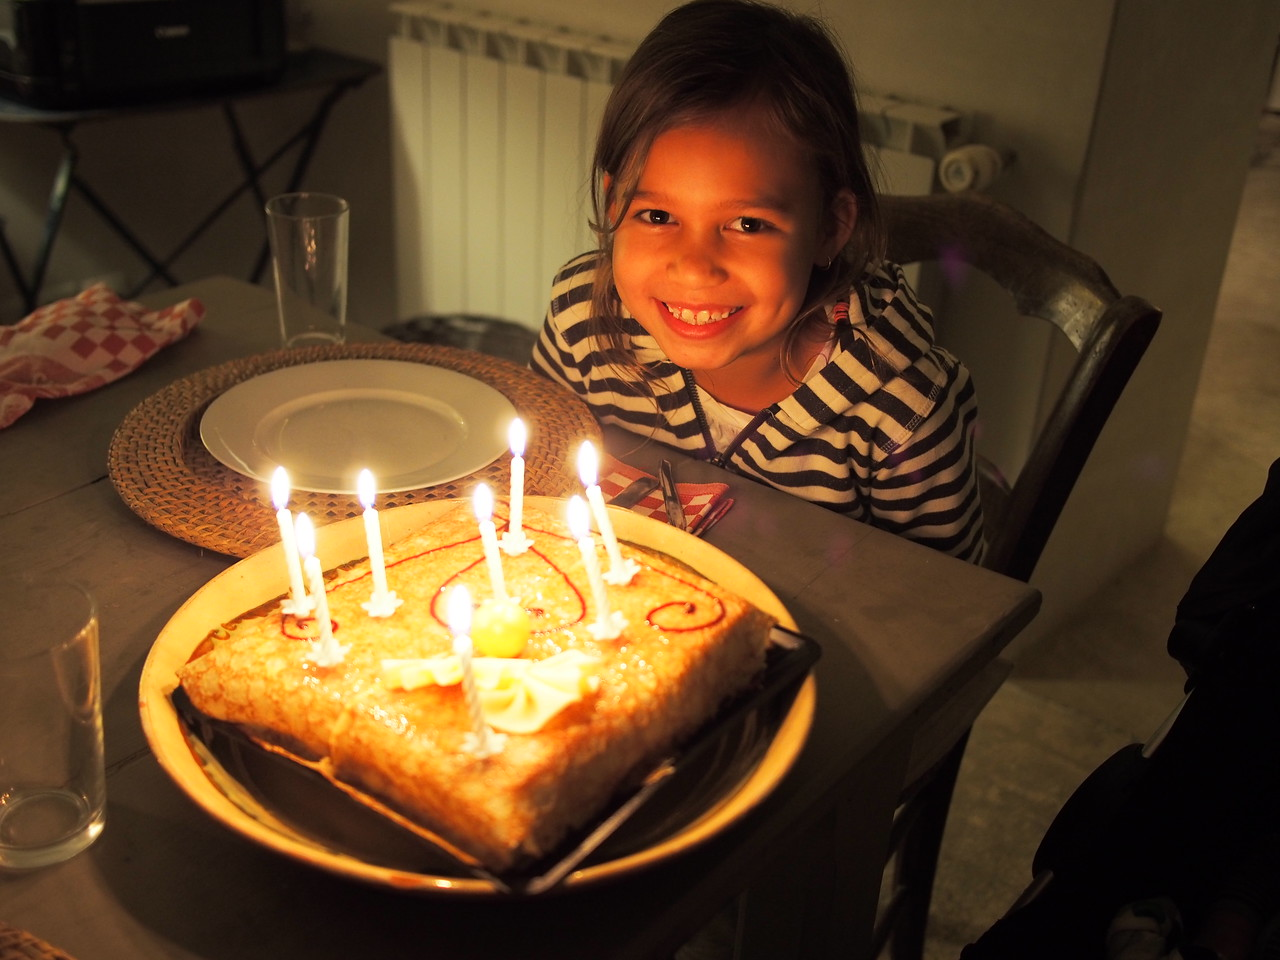 Lela 8th birthday, Lacoste